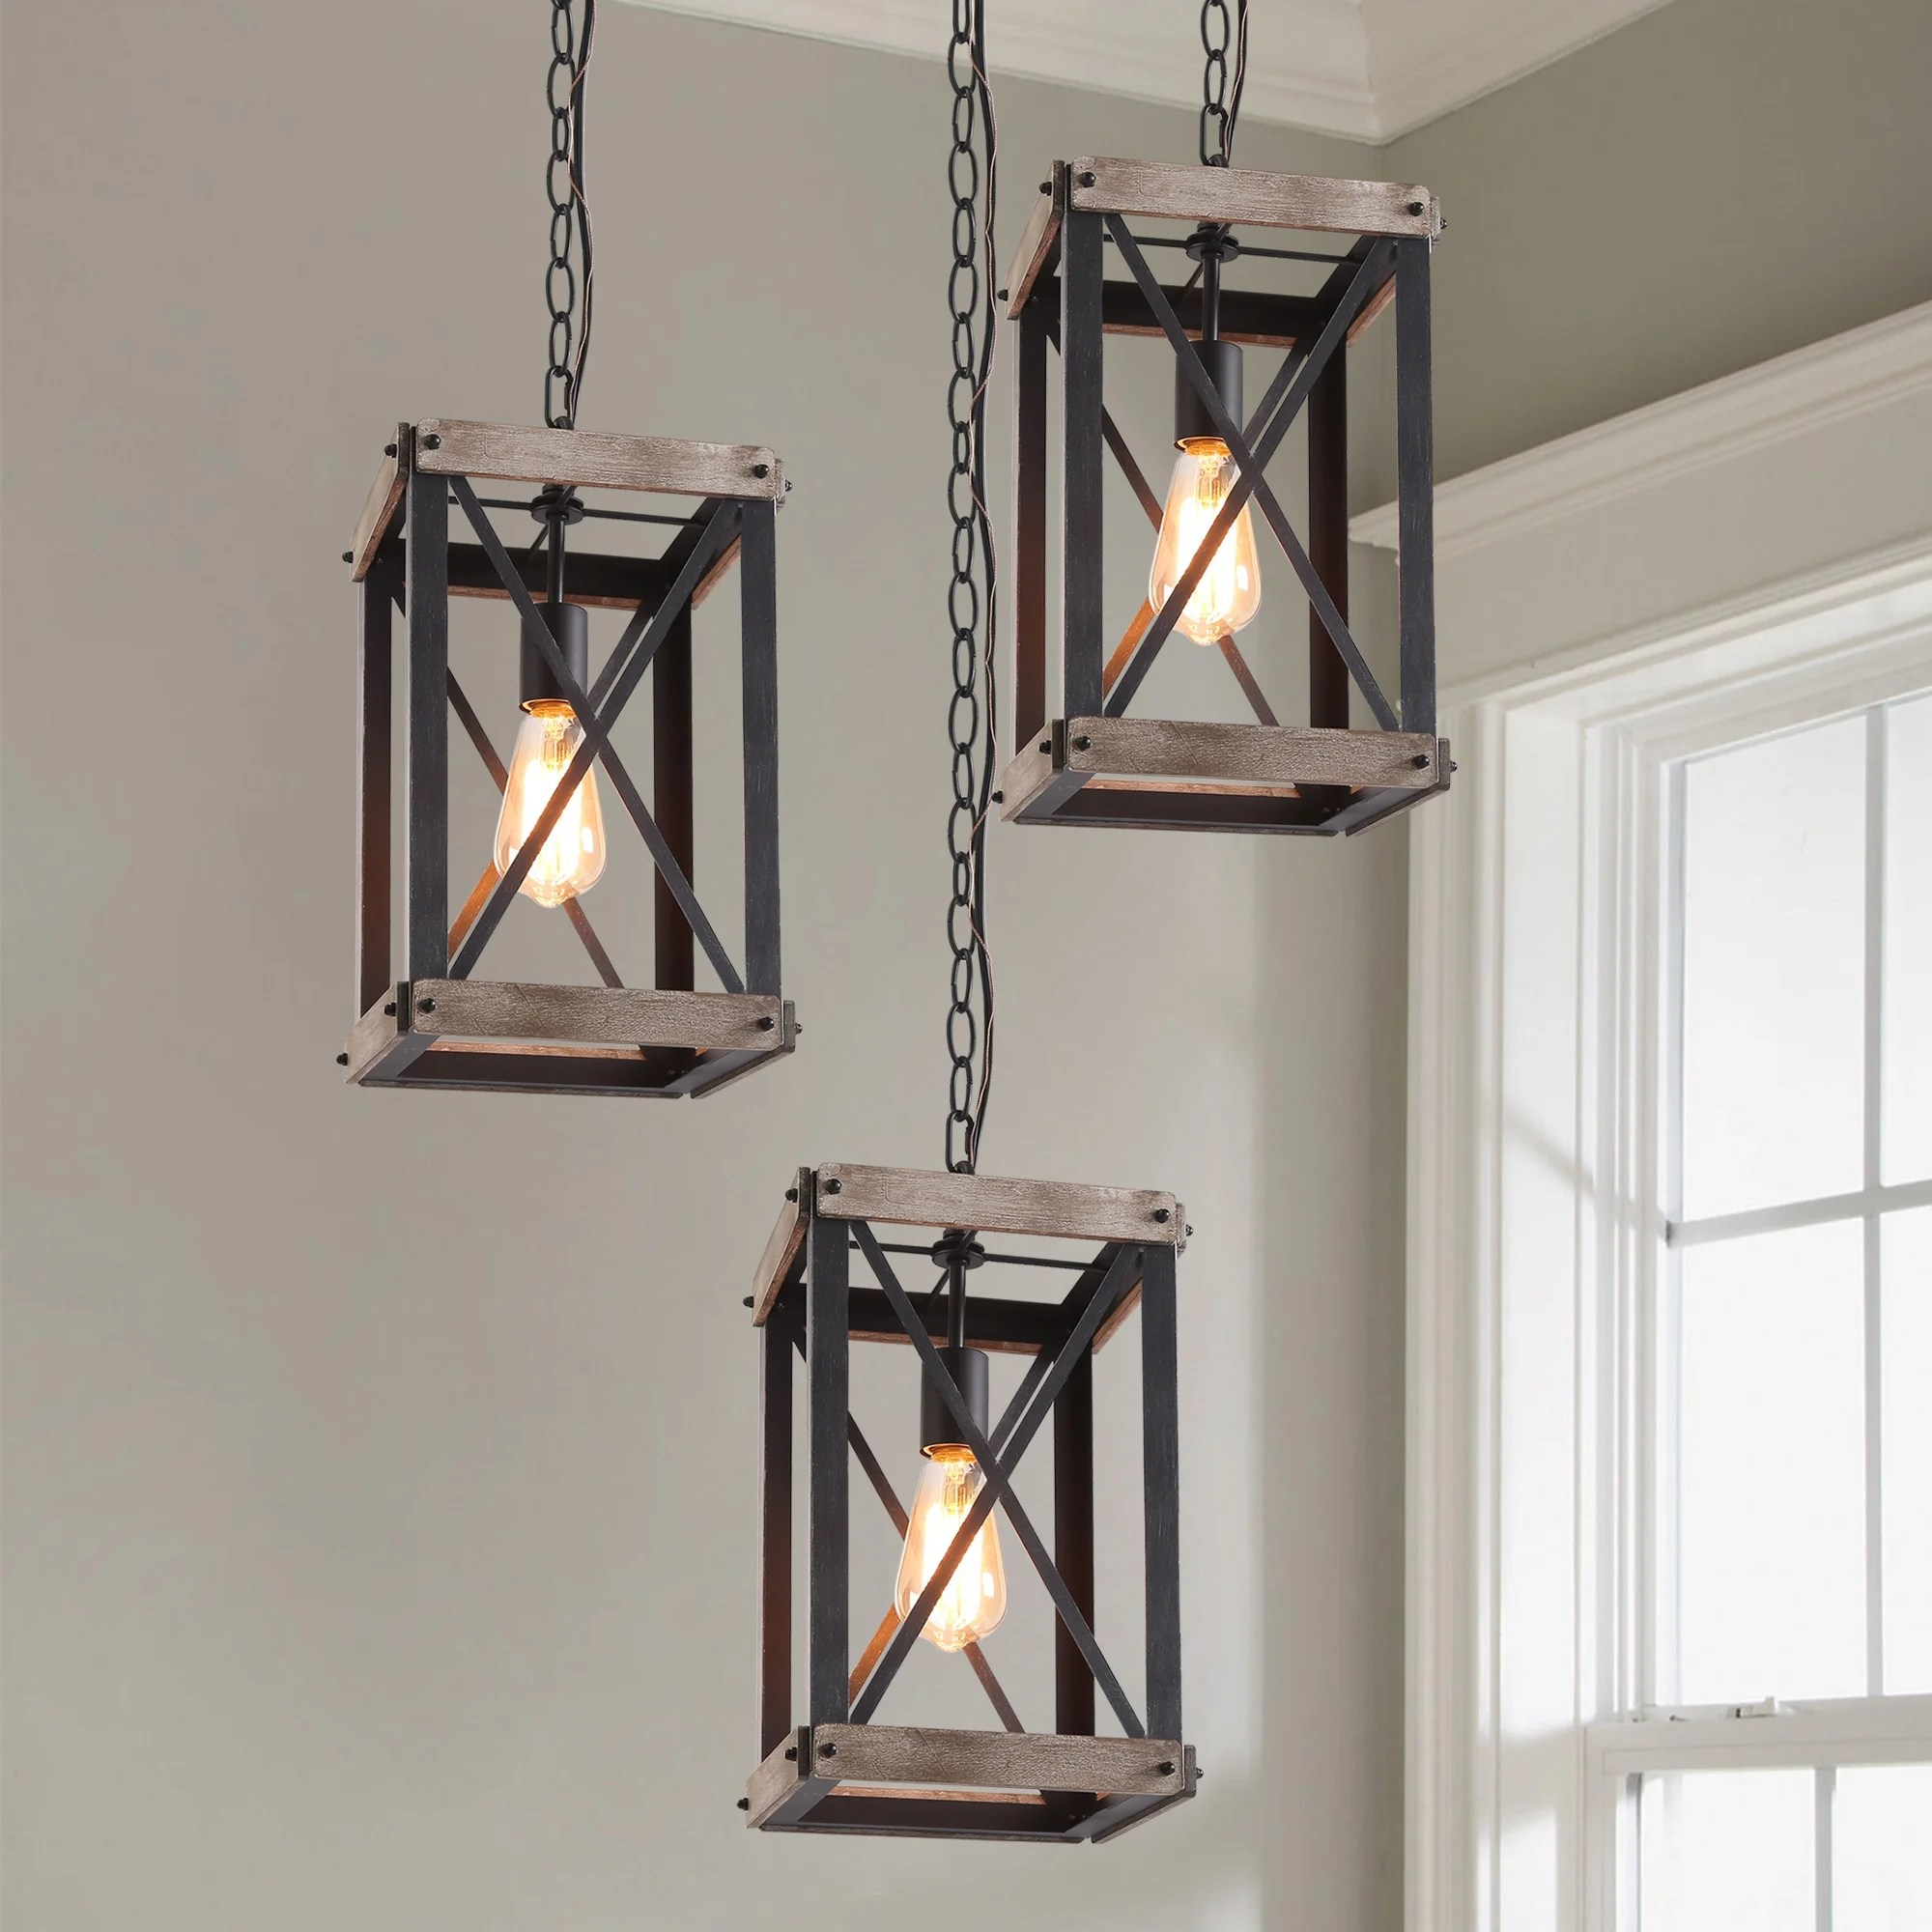 lnc 1 light foyer pendant lights rustic hanging lantern chandeliers